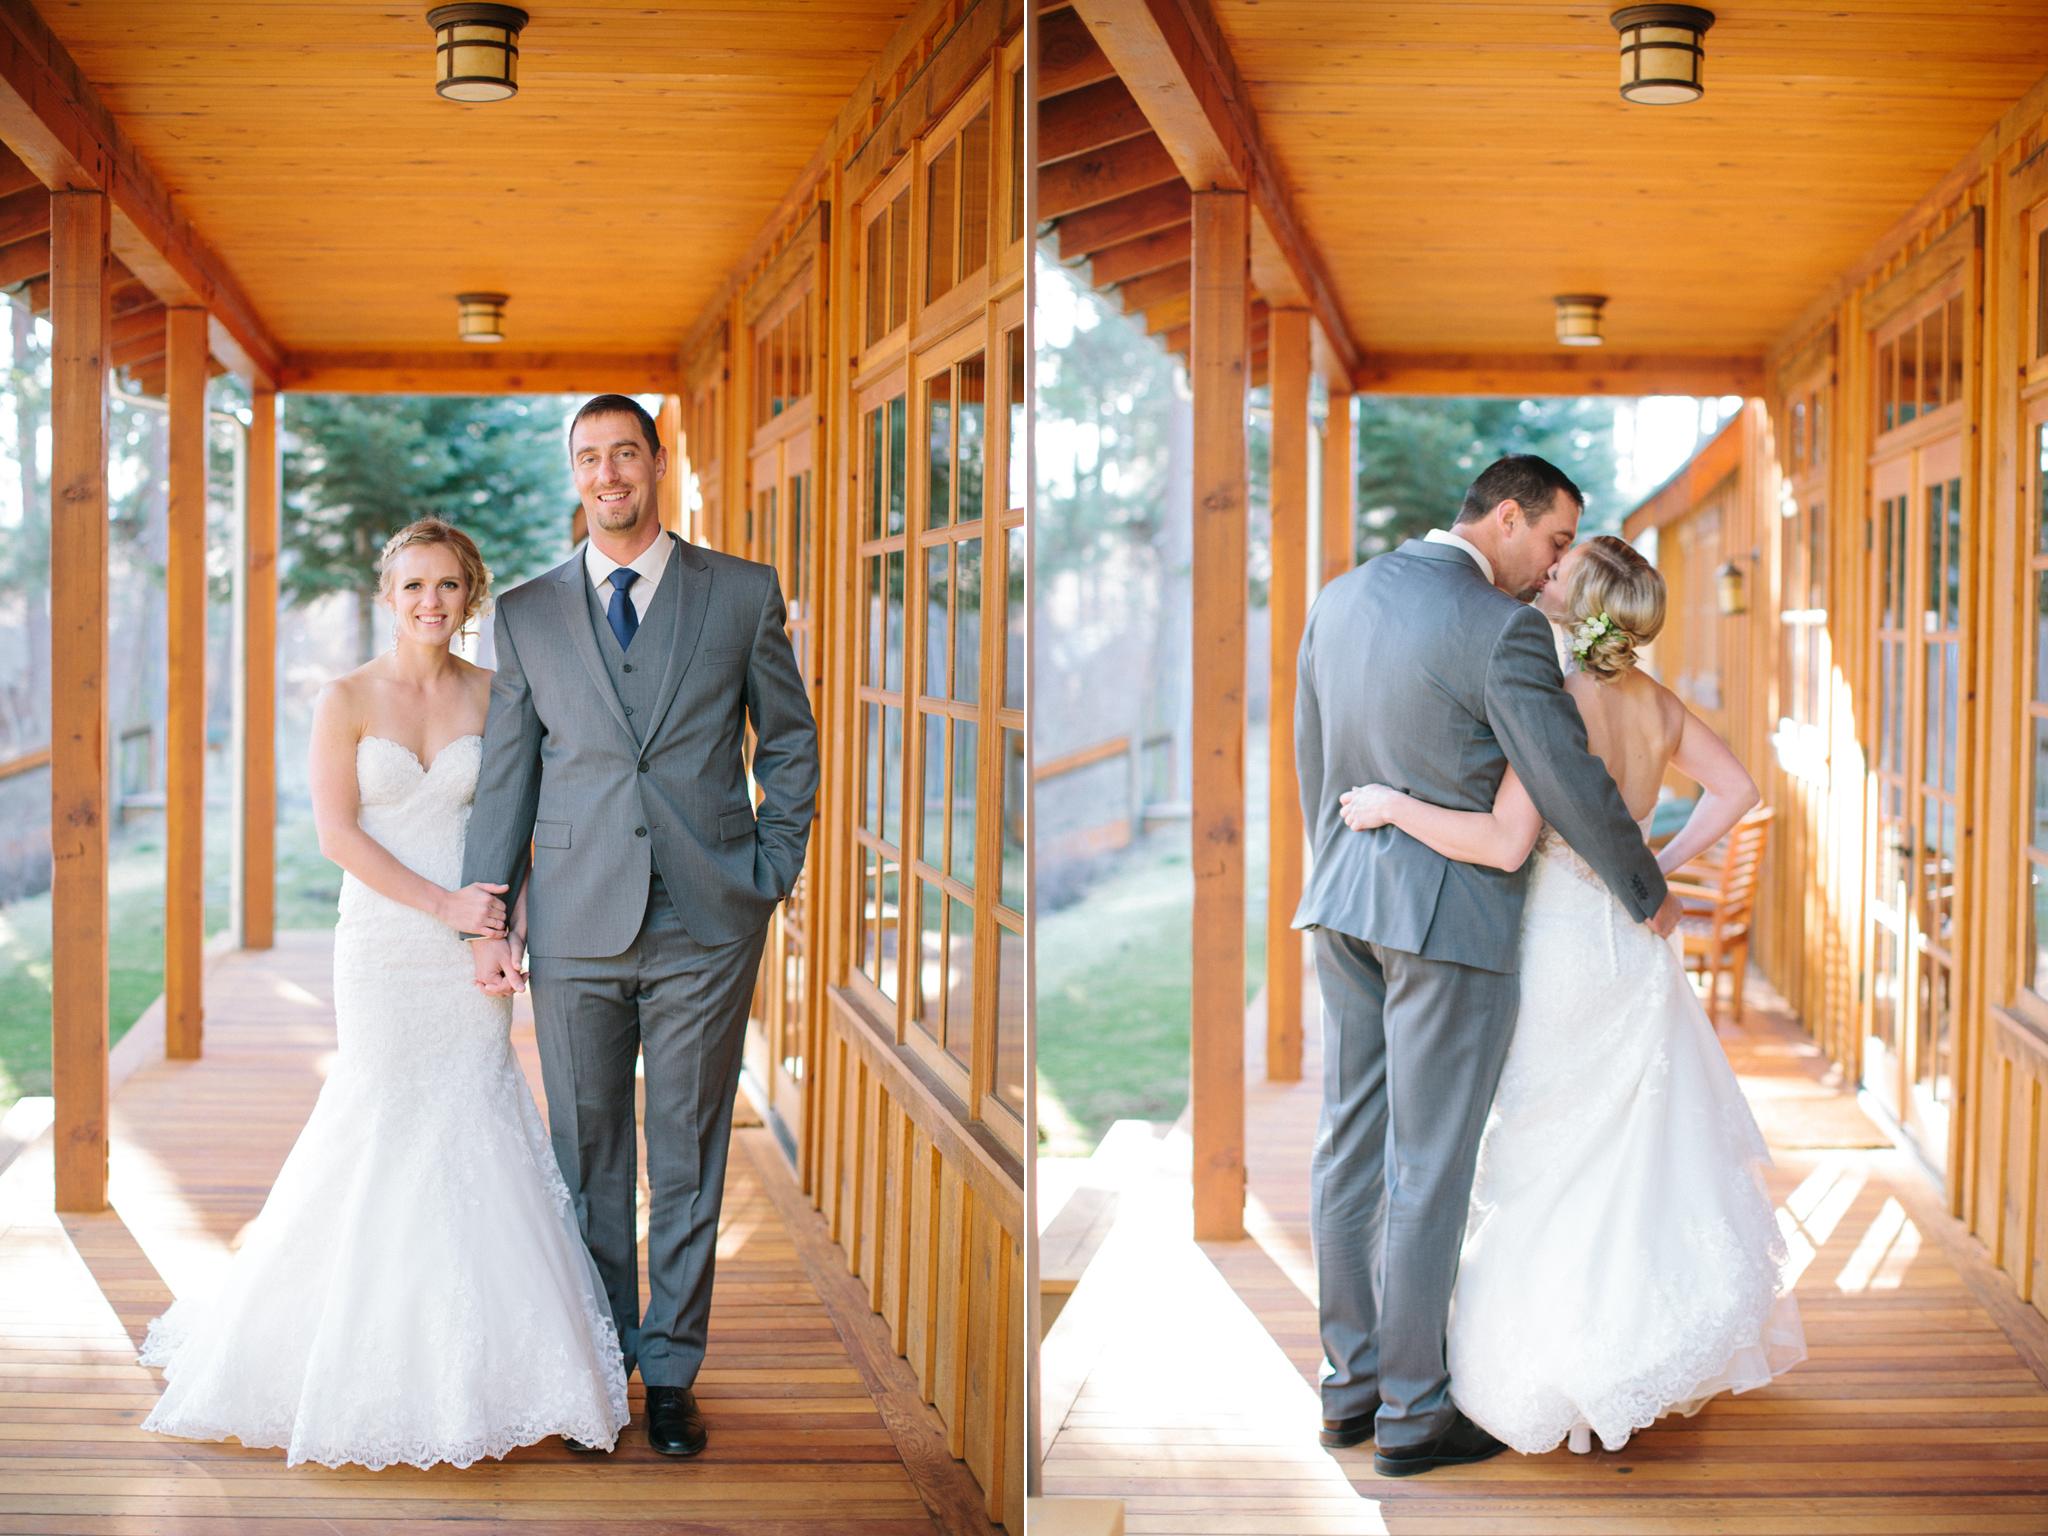 Bend Oregon Lake Creek Lodge Wedding by Michelle Cross-34.jpg